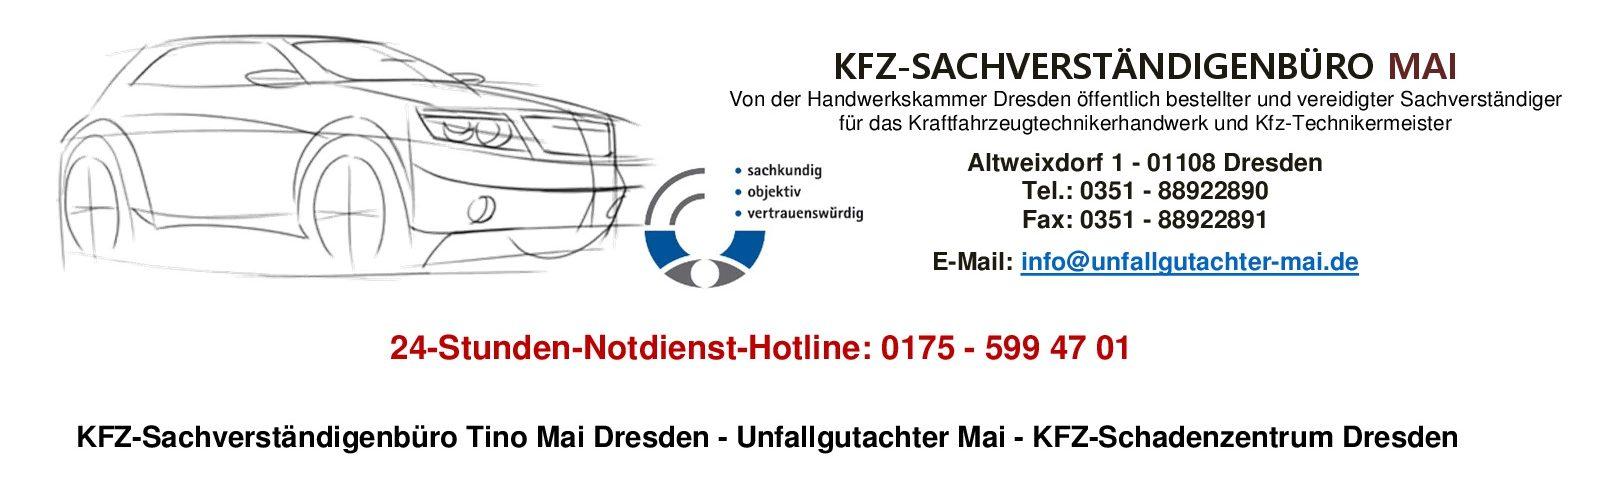 KFZ-Sachverständigenbüro Tino Mai Dresden – Unfallgutachter Mai – KFZ-Schadenzentrum Dresden